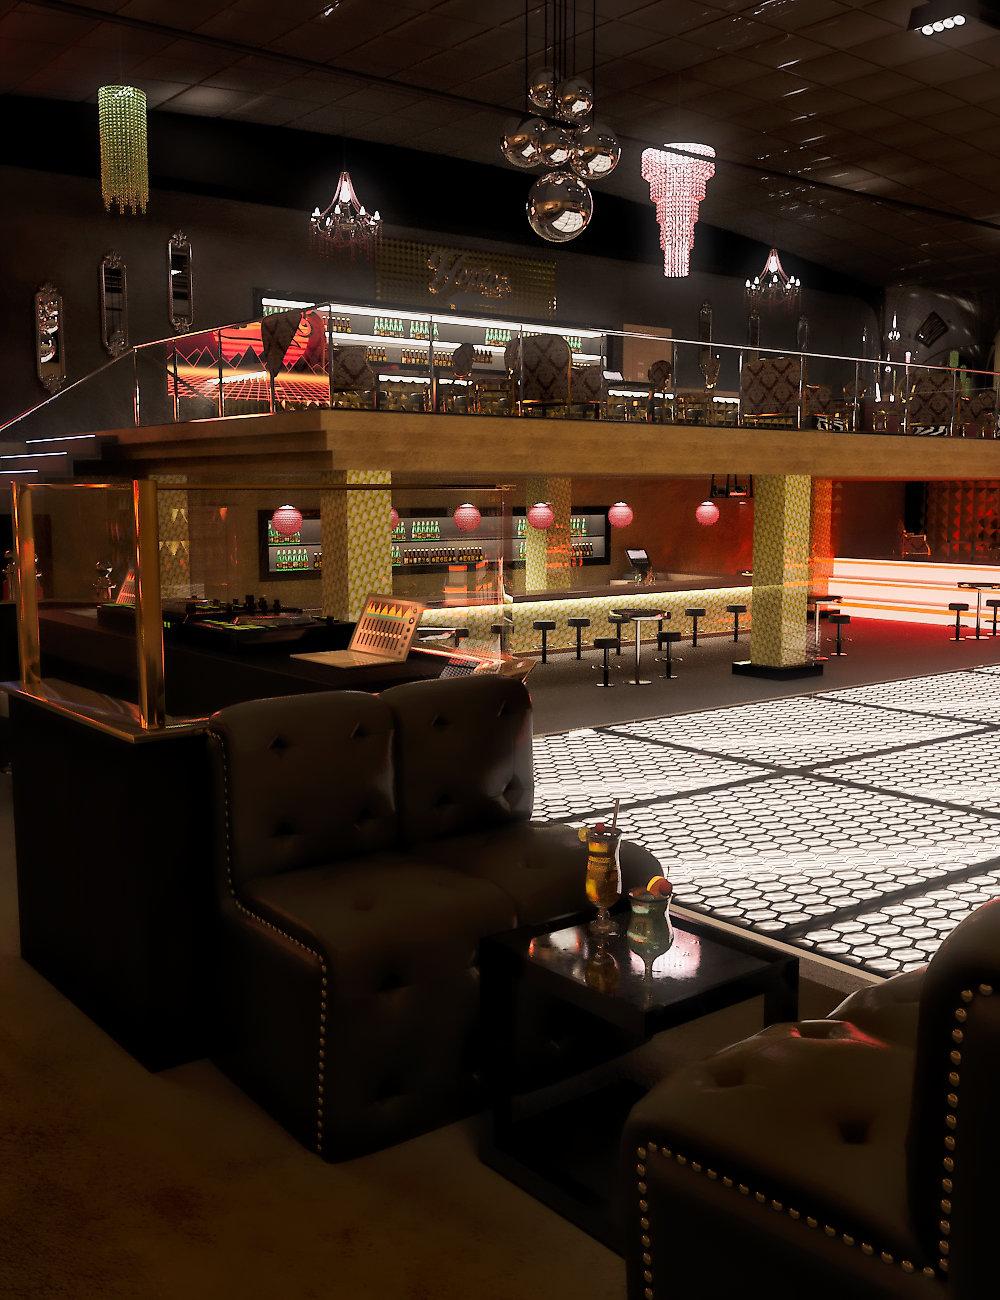 FG Nightclub by: Fugazi1968Ironman, 3D Models by Daz 3D